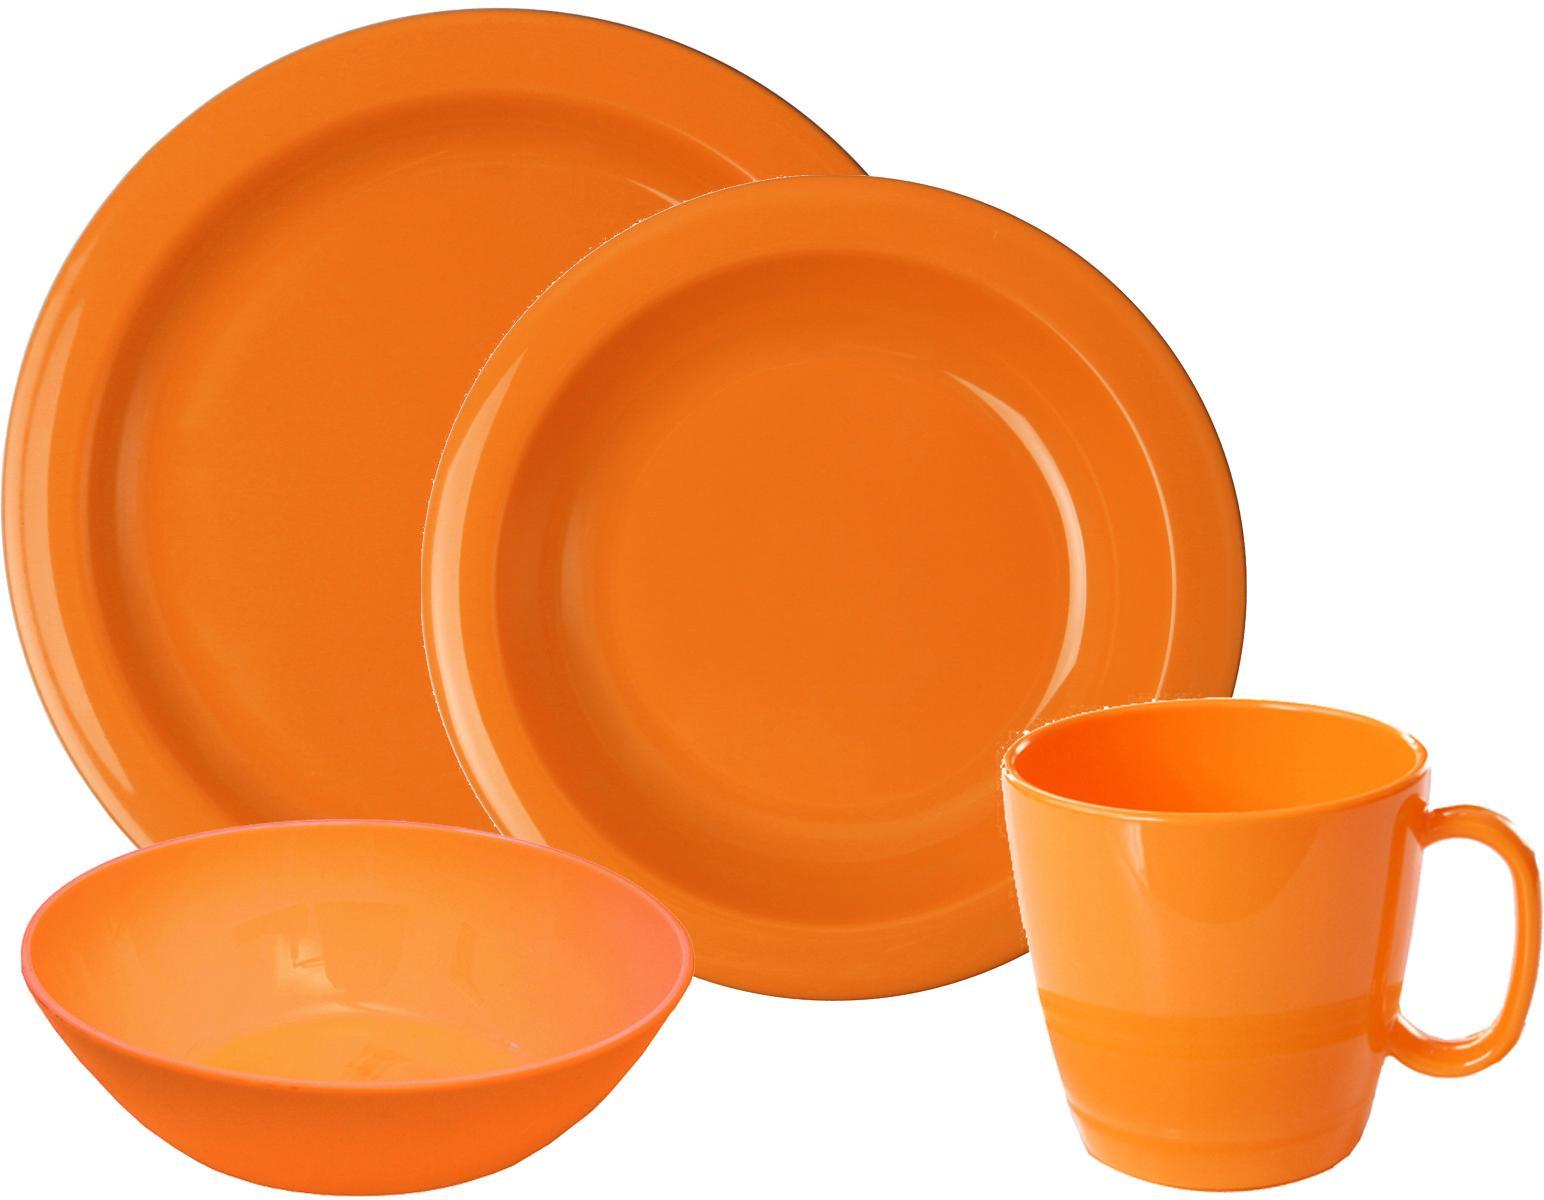 WACA Frühstücks-Set, (Set, 8 tlg.) orange Frühstücksset Eierbecher Geschirr, Porzellan Tischaccessoires Haushaltswaren Frühstücks-Set